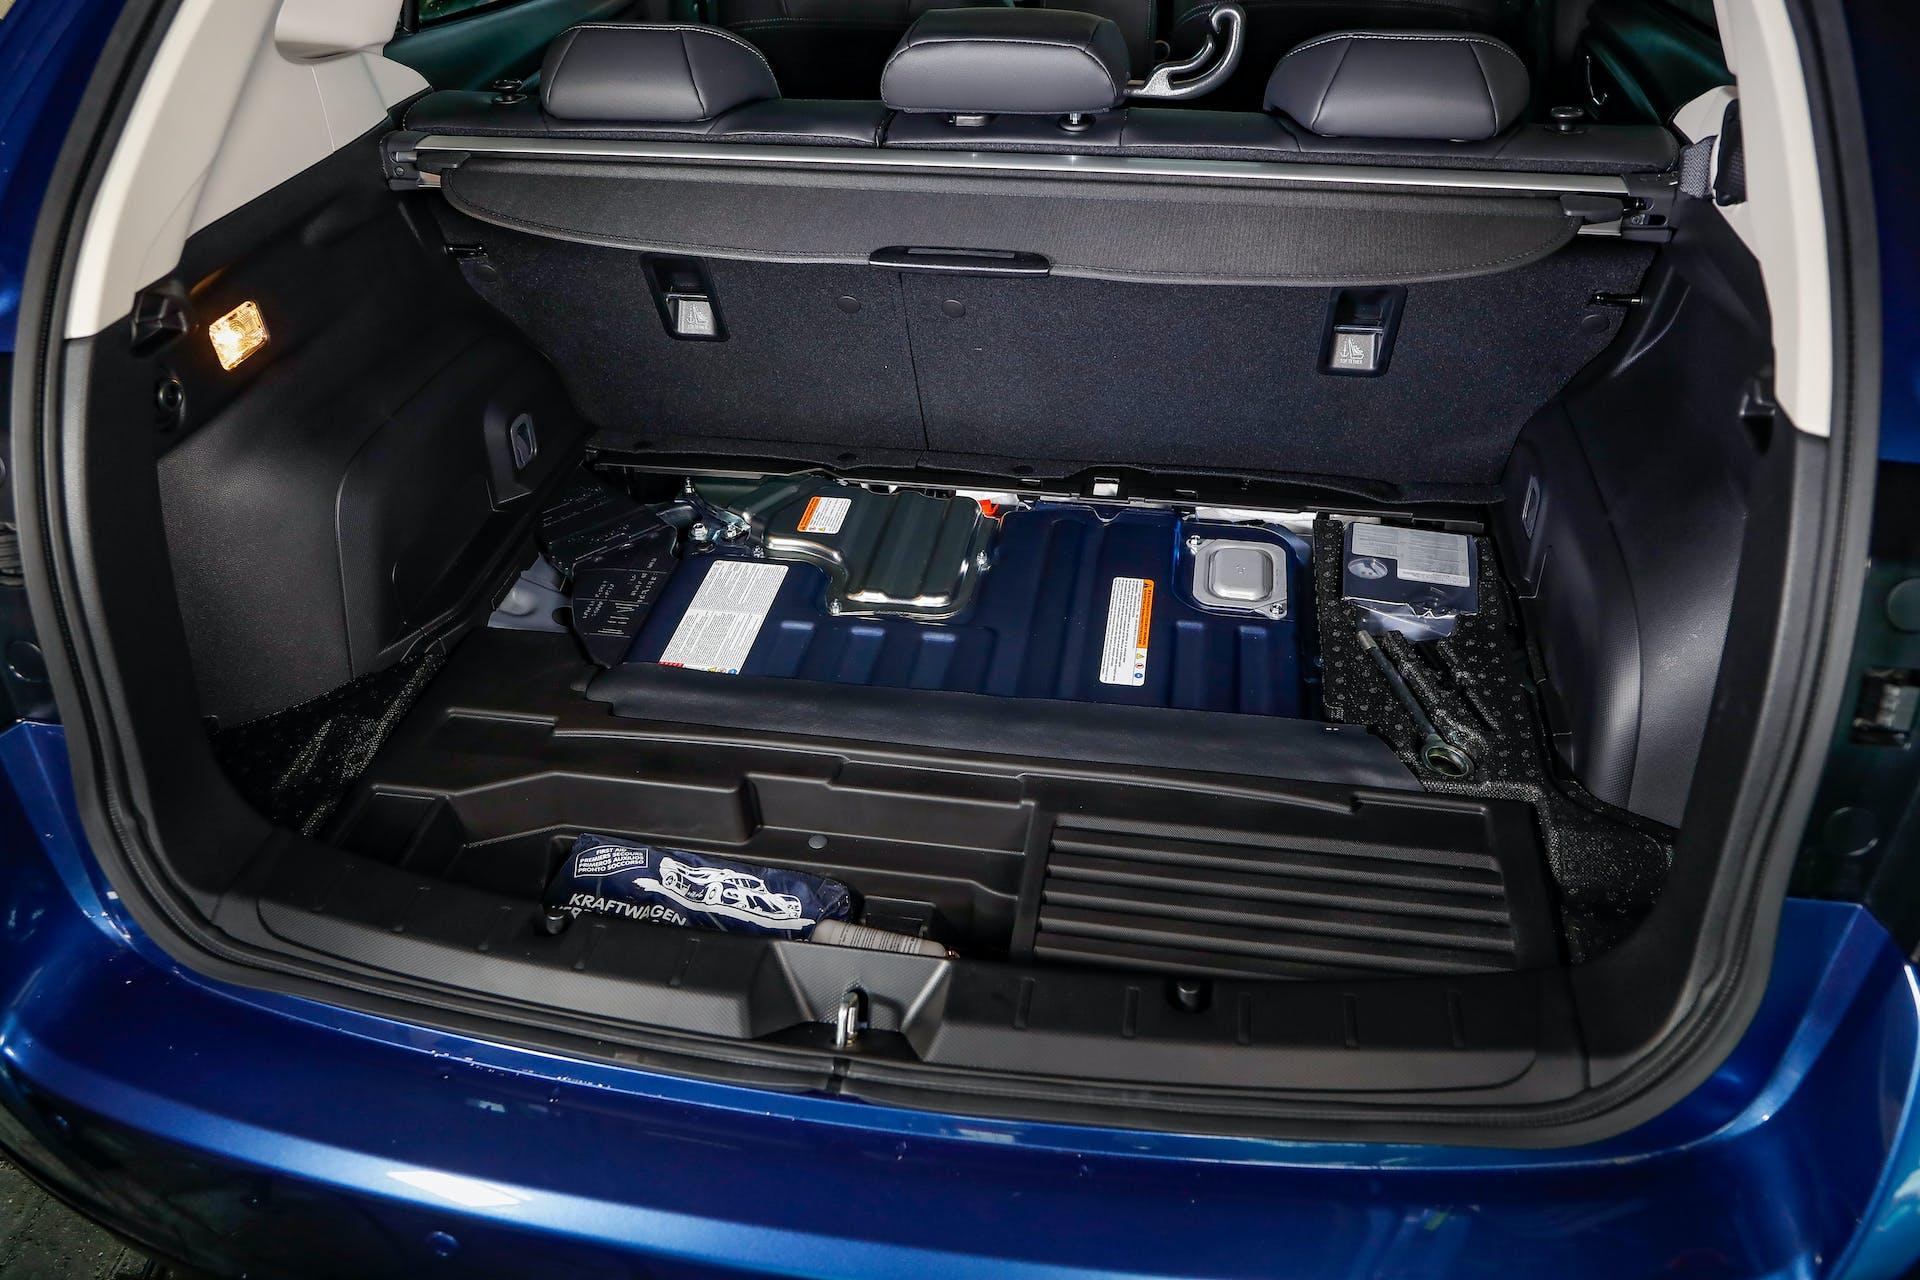 Subaru Impreza pacco batterie